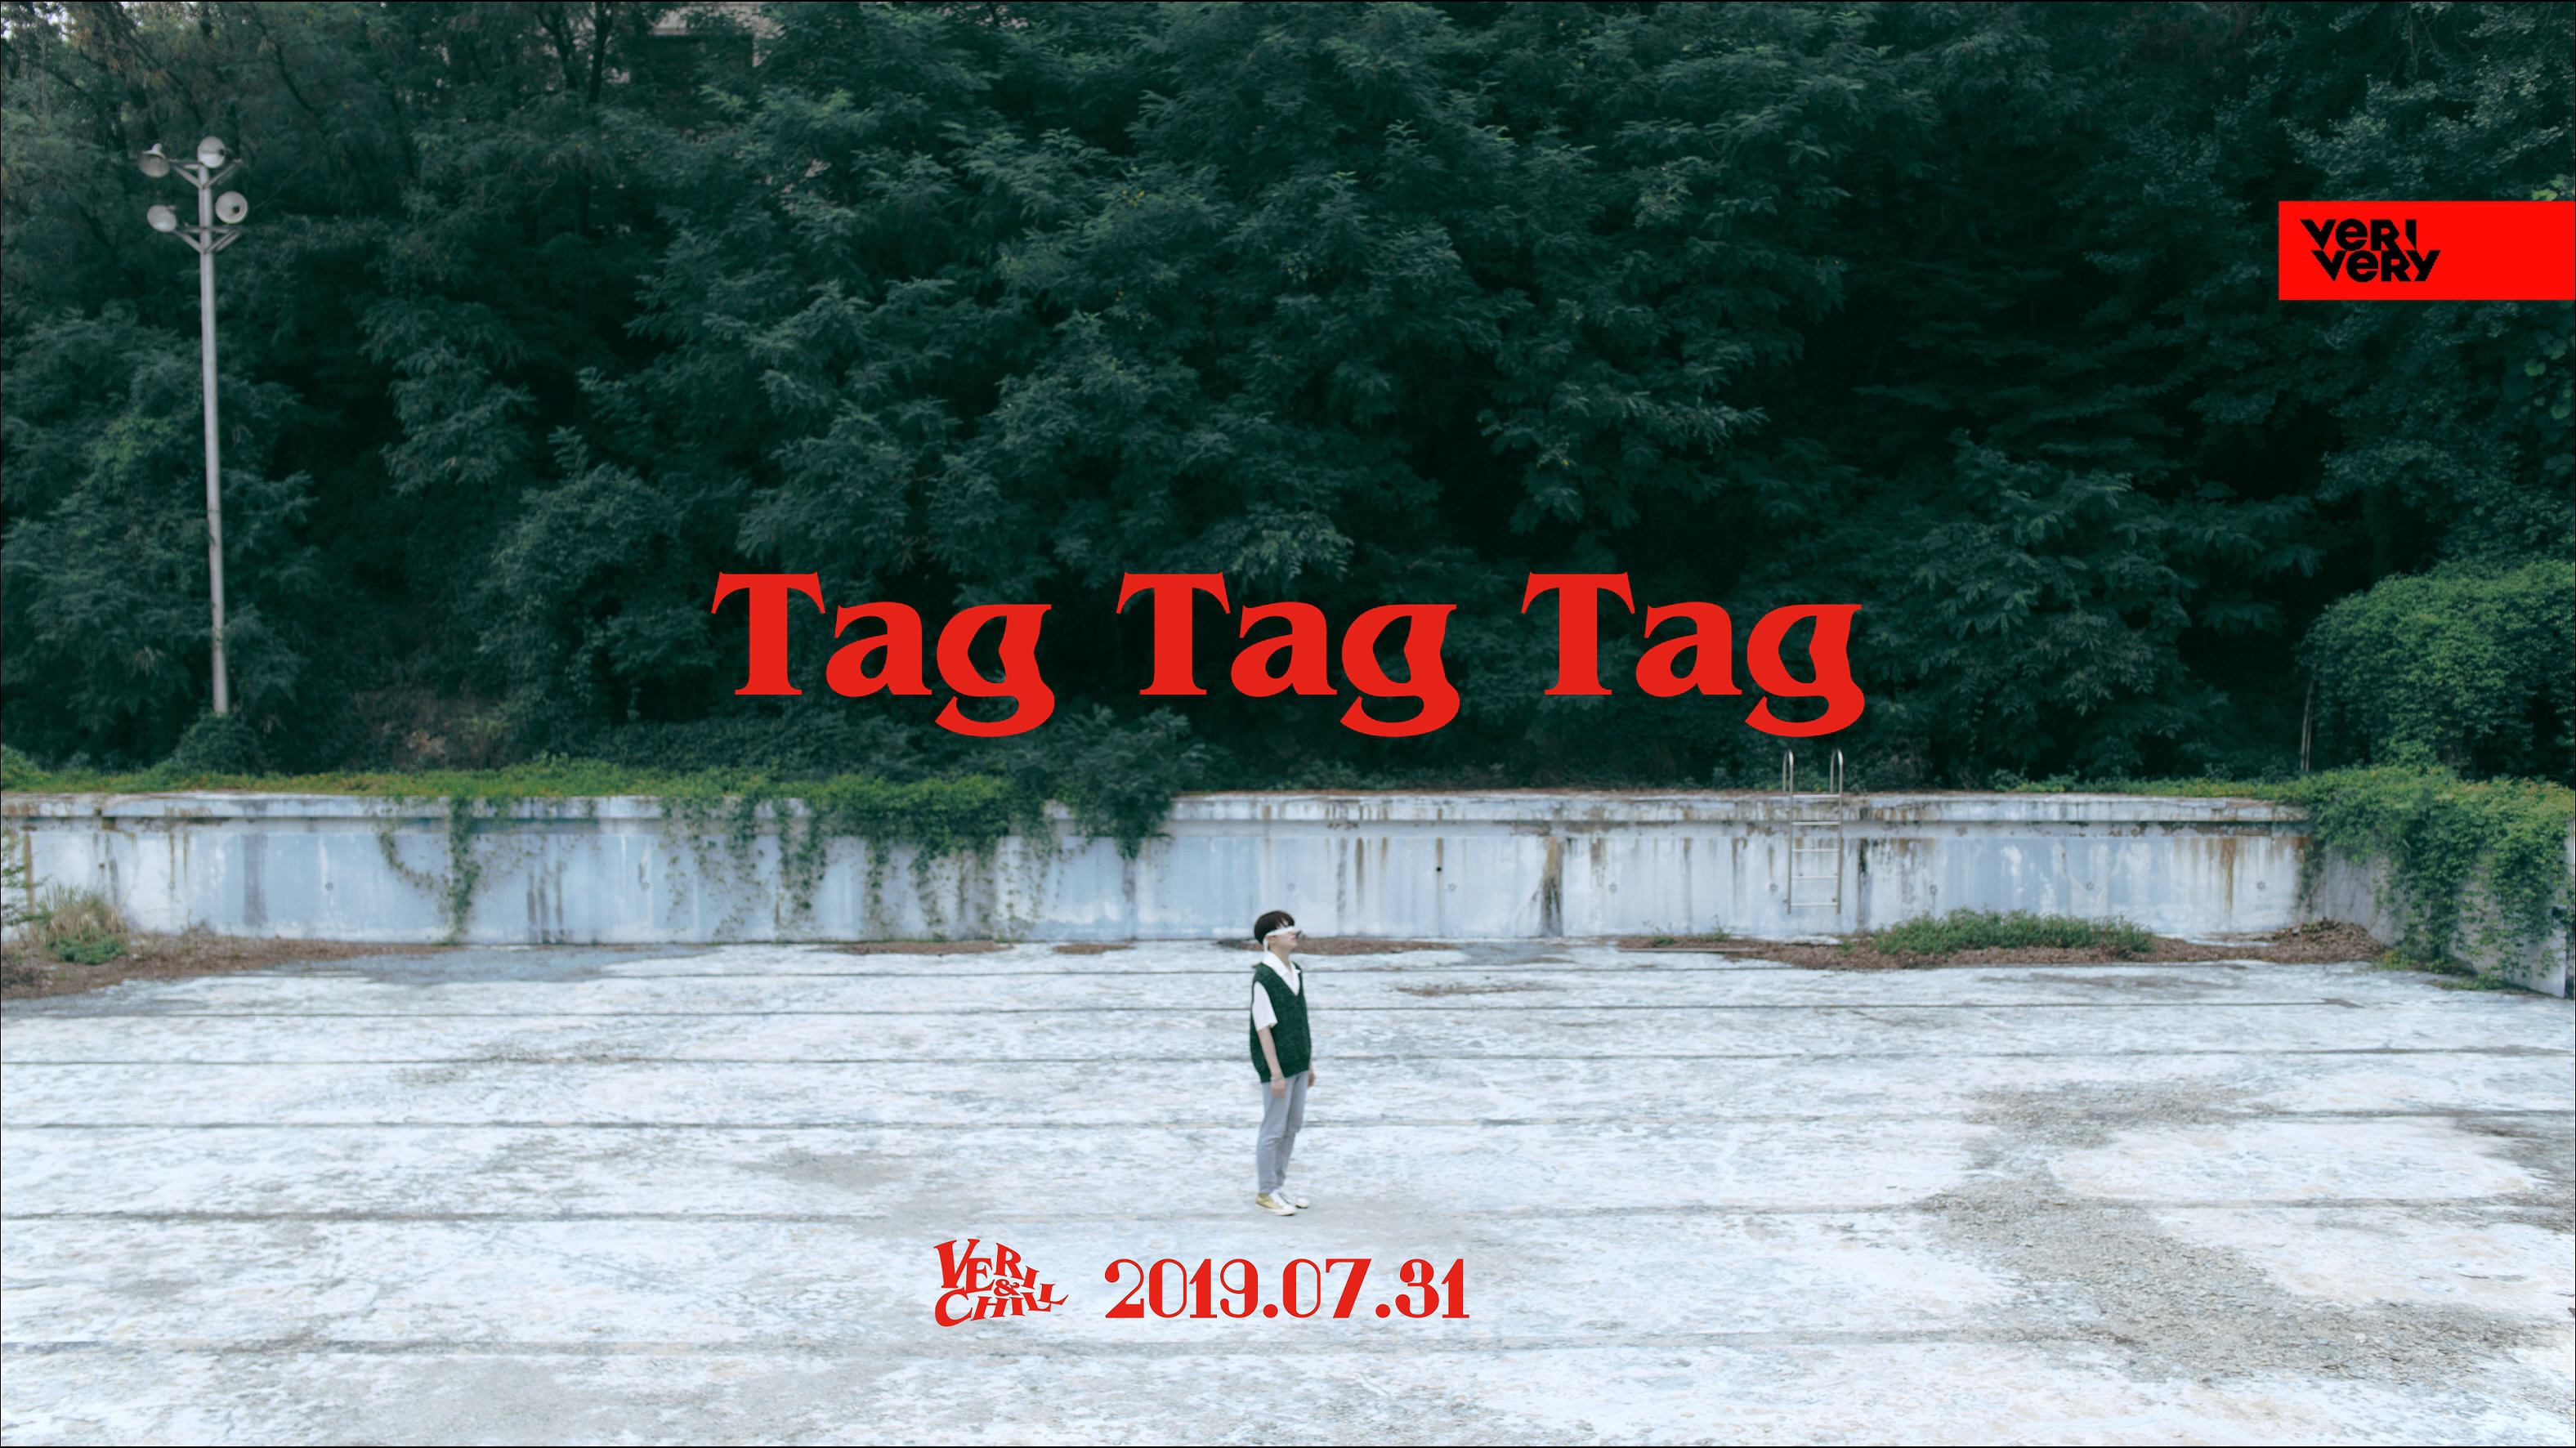 VERIVERY - 'Tag Tag Tag' Official M/V Teaser